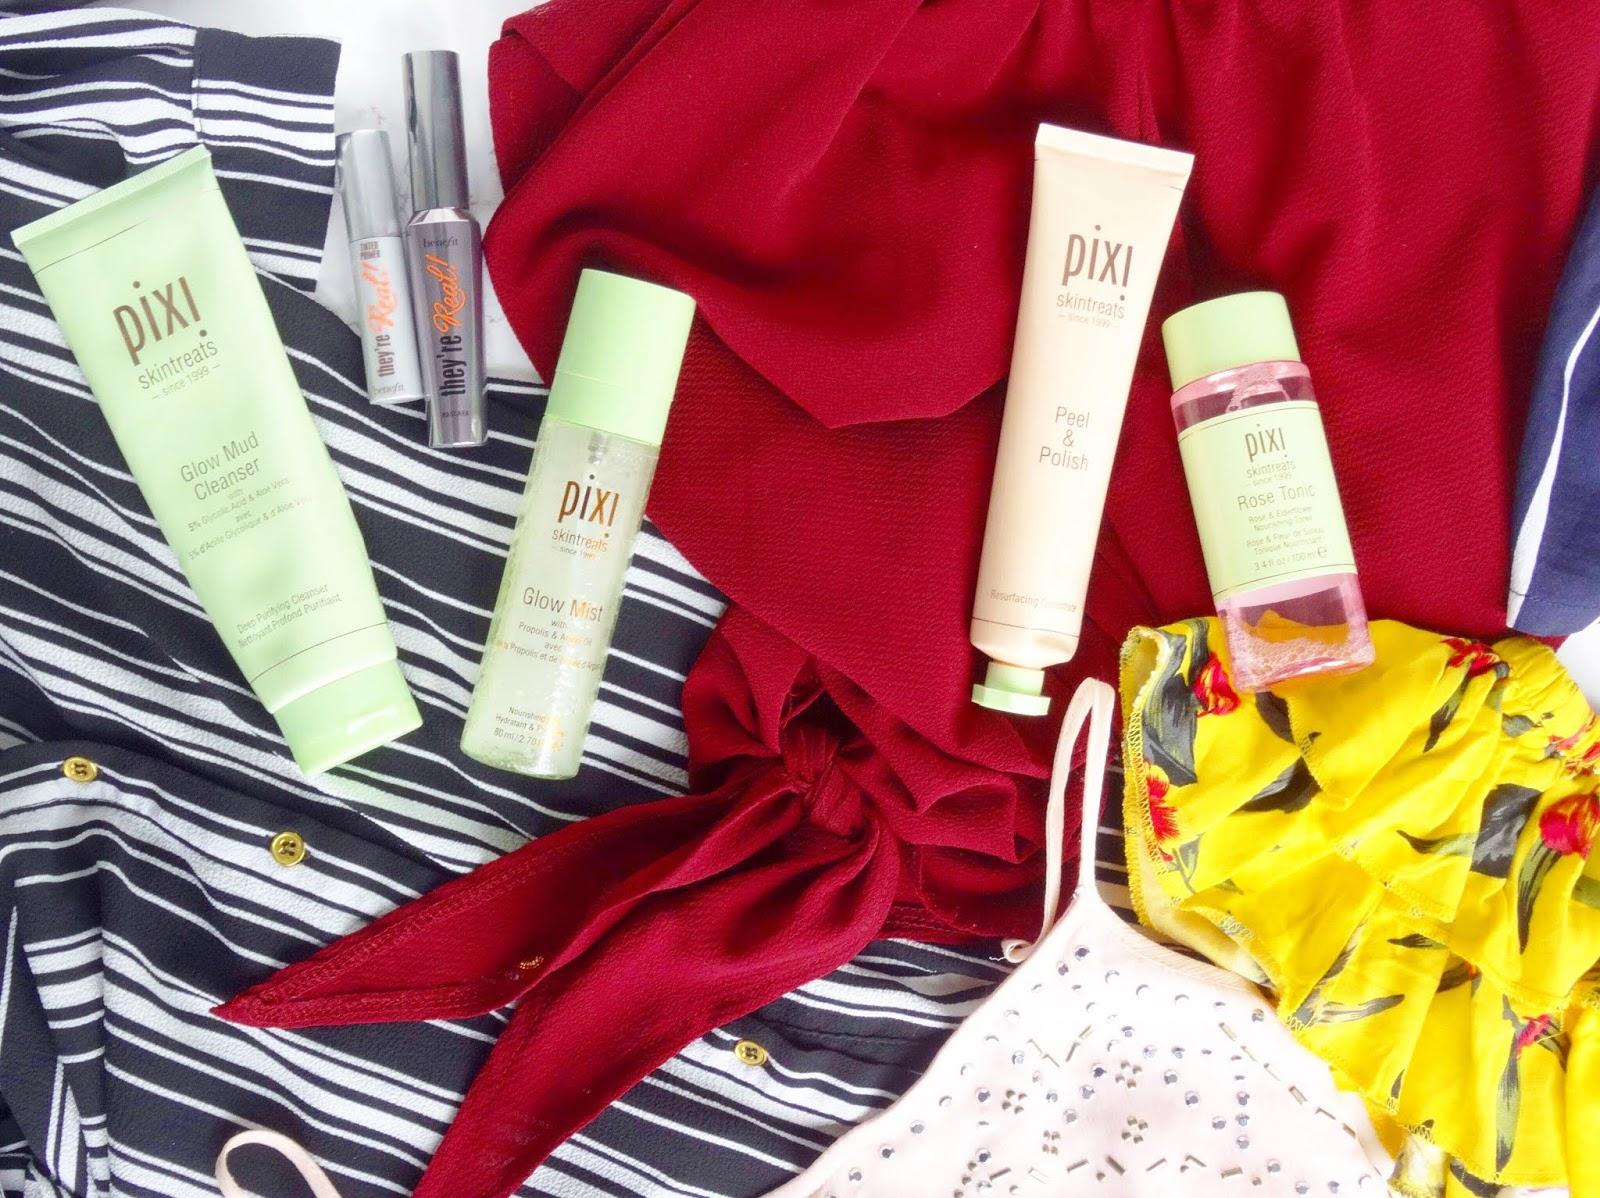 Pixi Beauty Bundle